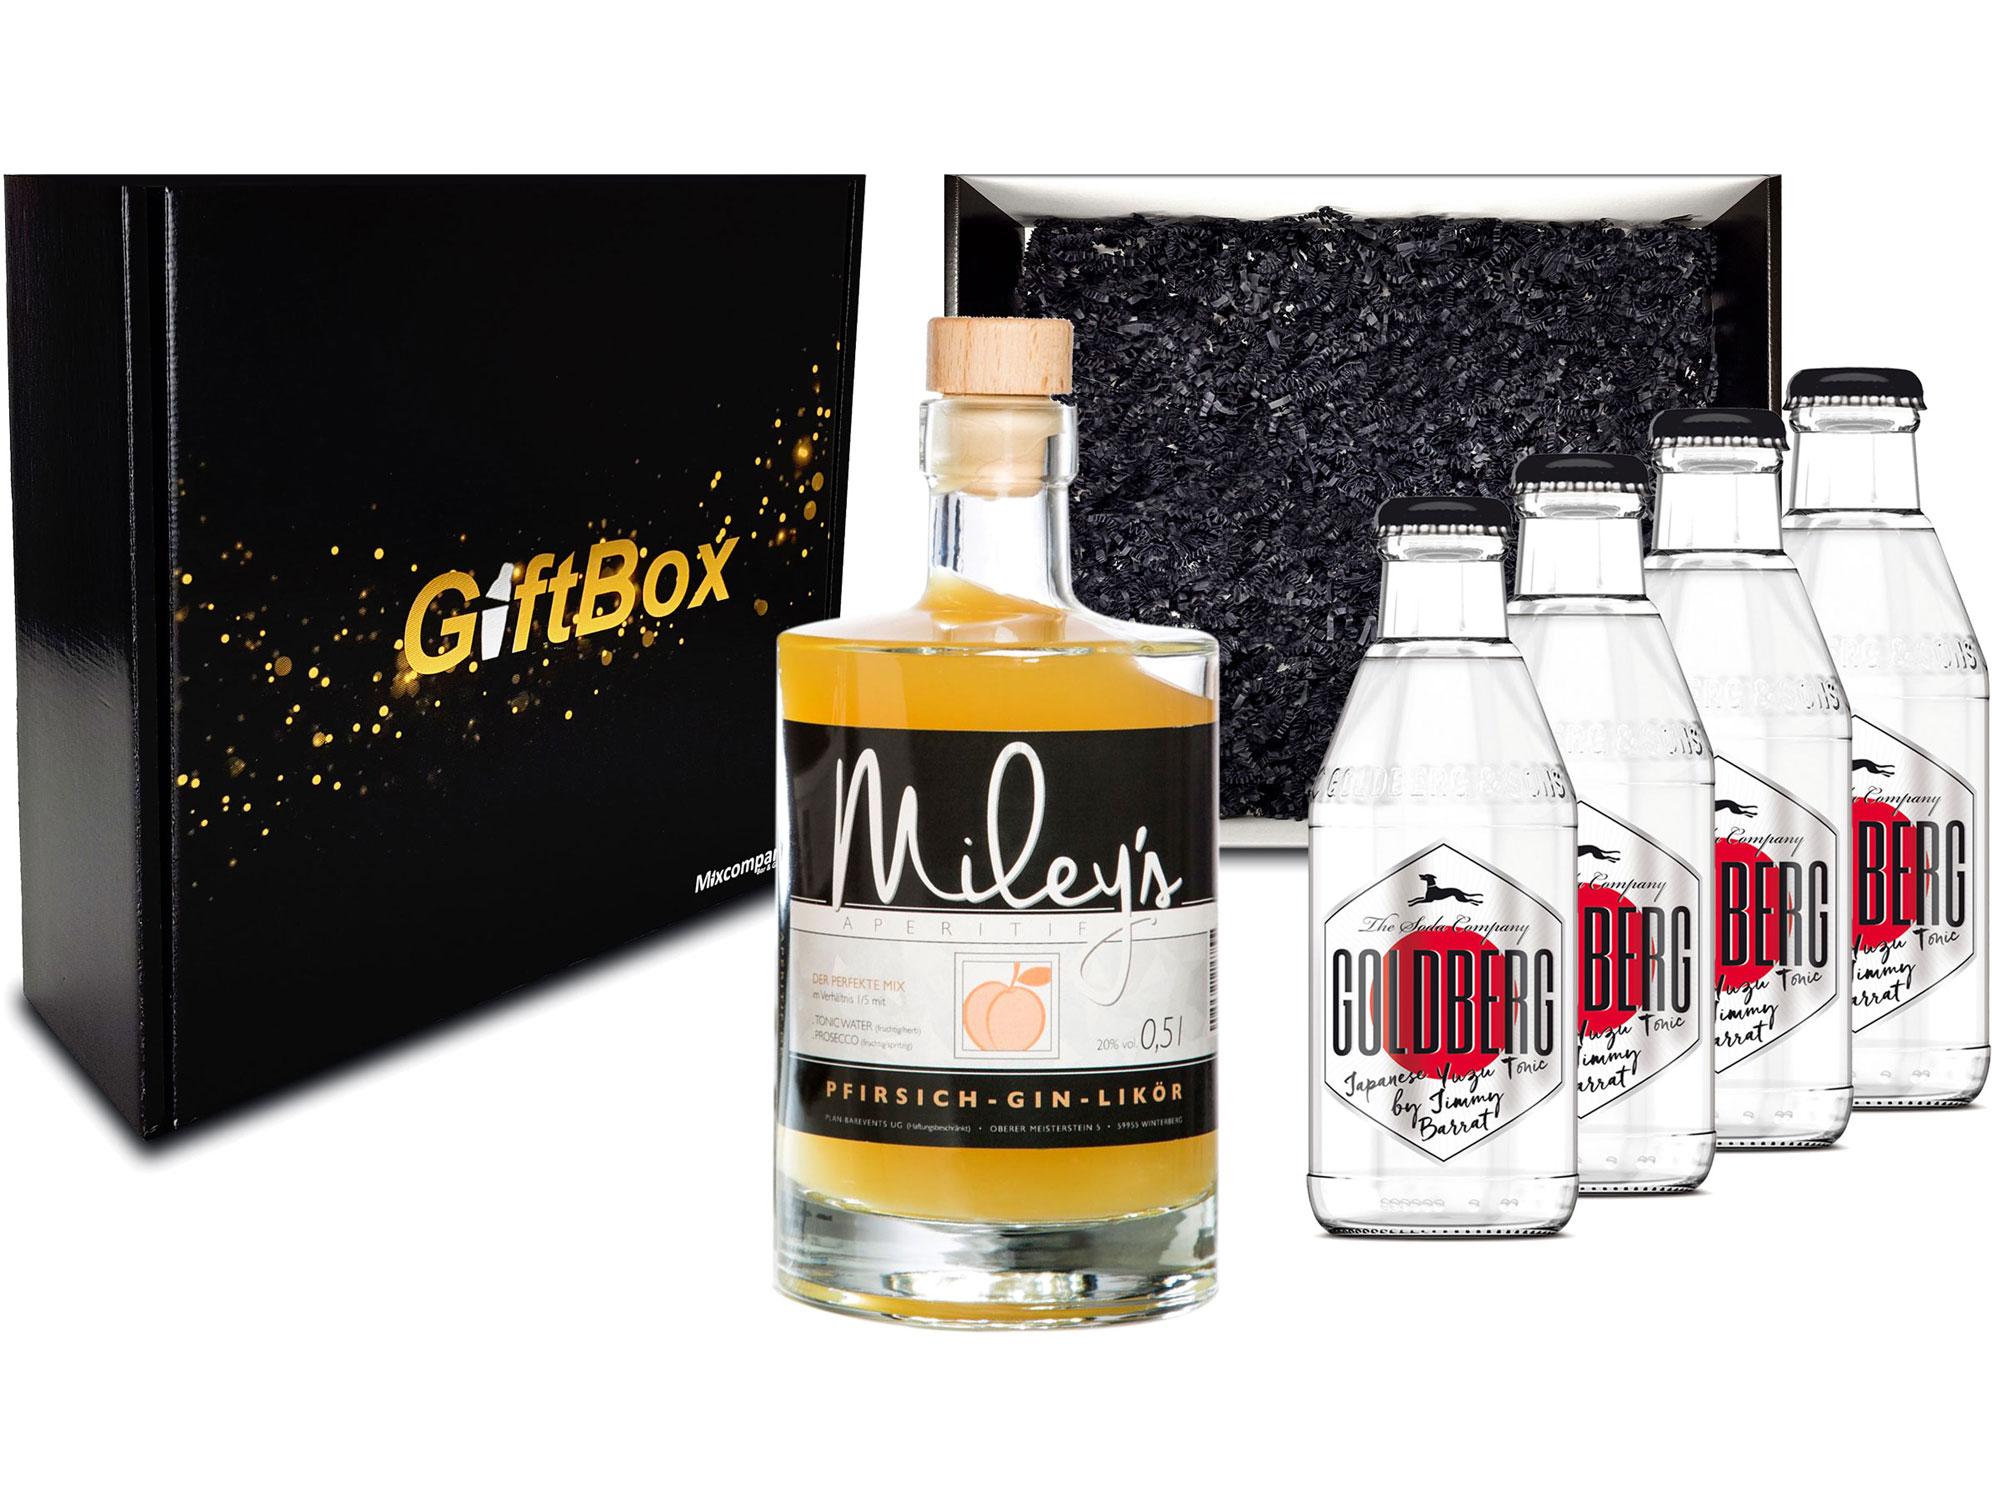 Gin Tonic Giftbox Geschenkset - Mileys Pfirsich Gin Likör 0,5l (20% Vol) + 4x Goldberg Japanese Yuzu Tonic Water 200ml inkl. Pfand MEHRWEG - [Enthält Sulfite]